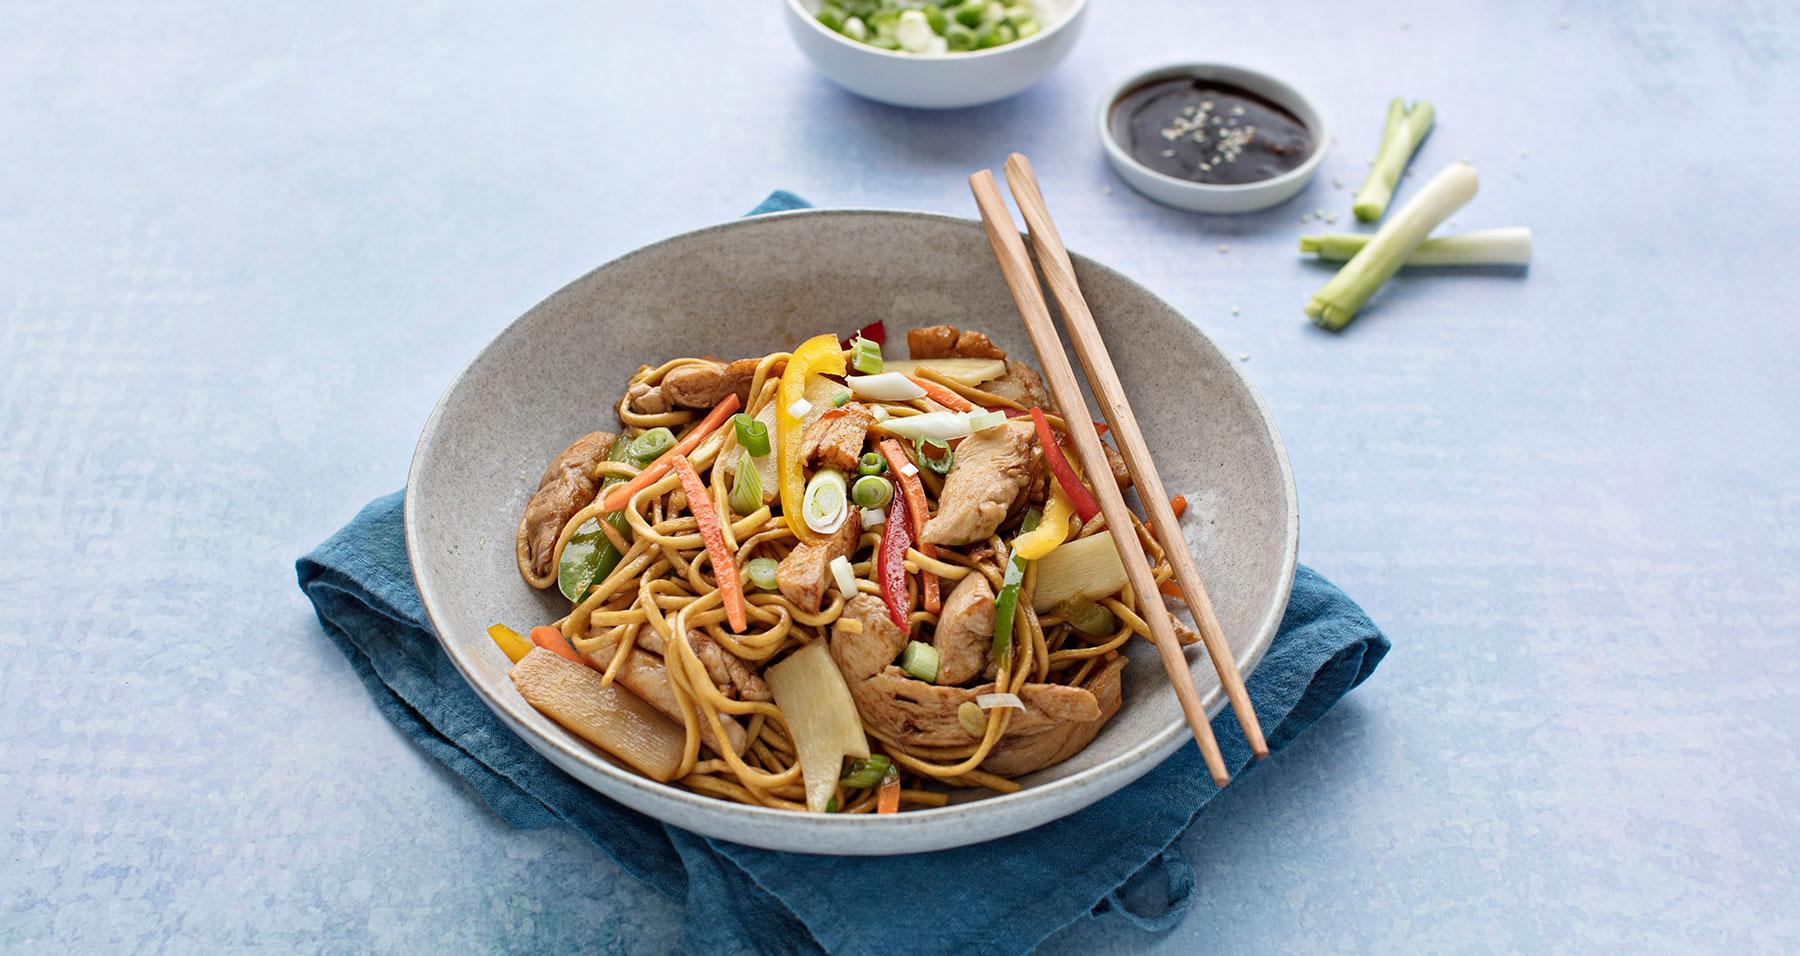 Ballymaguire-Foods-Noodles-landscape